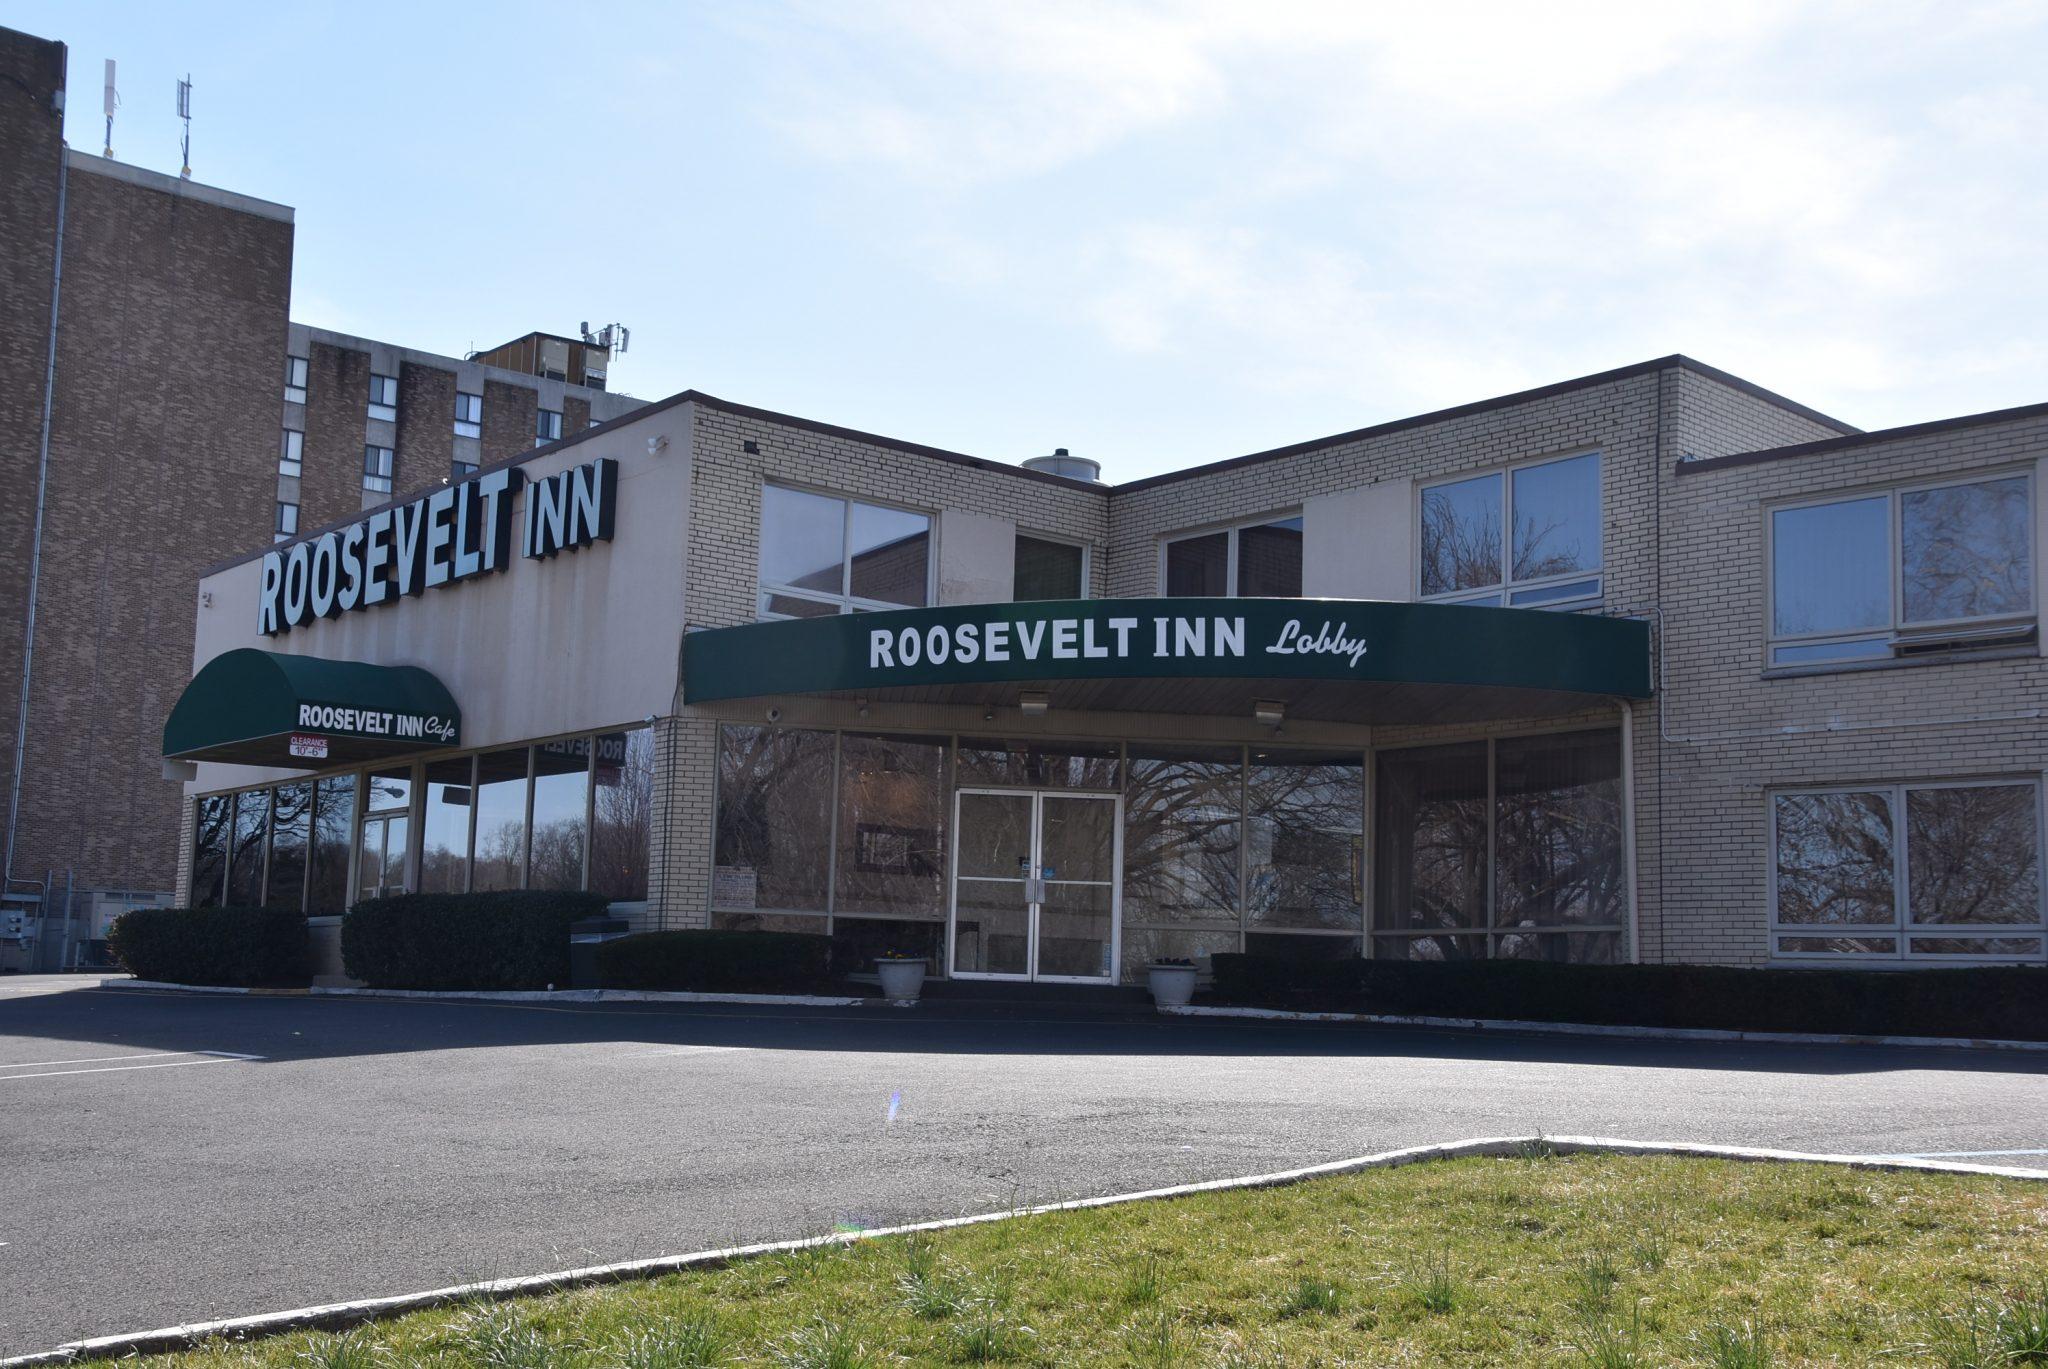 roosevelt inn days inn named in sex trafficking lawsuits. Black Bedroom Furniture Sets. Home Design Ideas